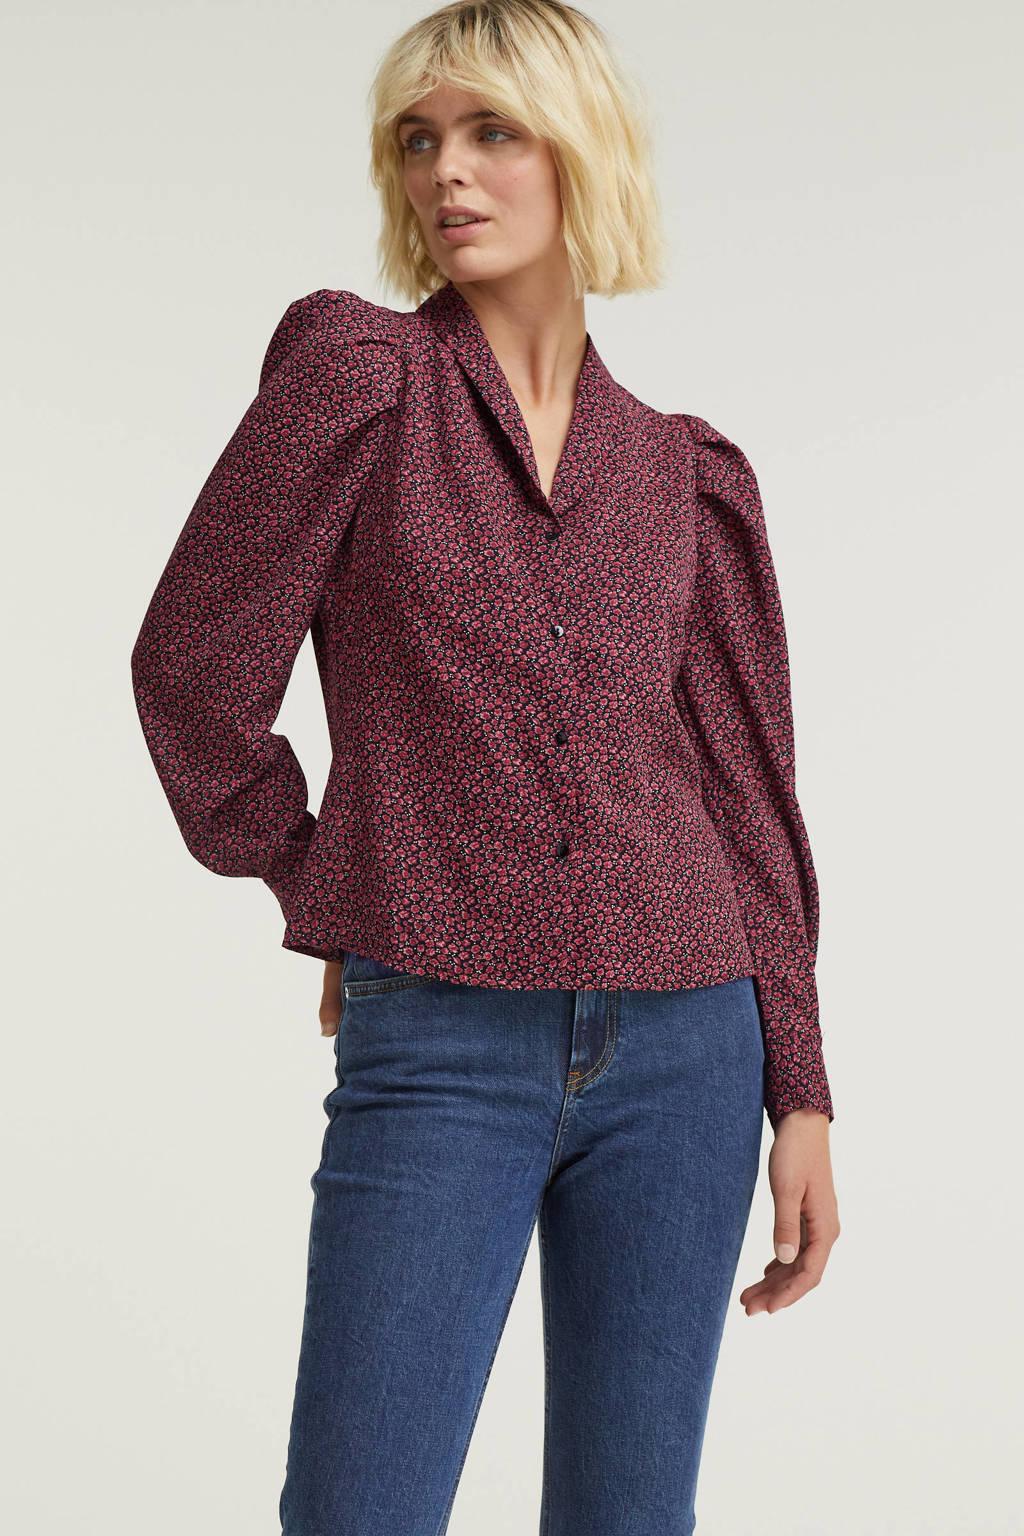 Esqualo gebloemde blouse zwart/roze/groen, Print